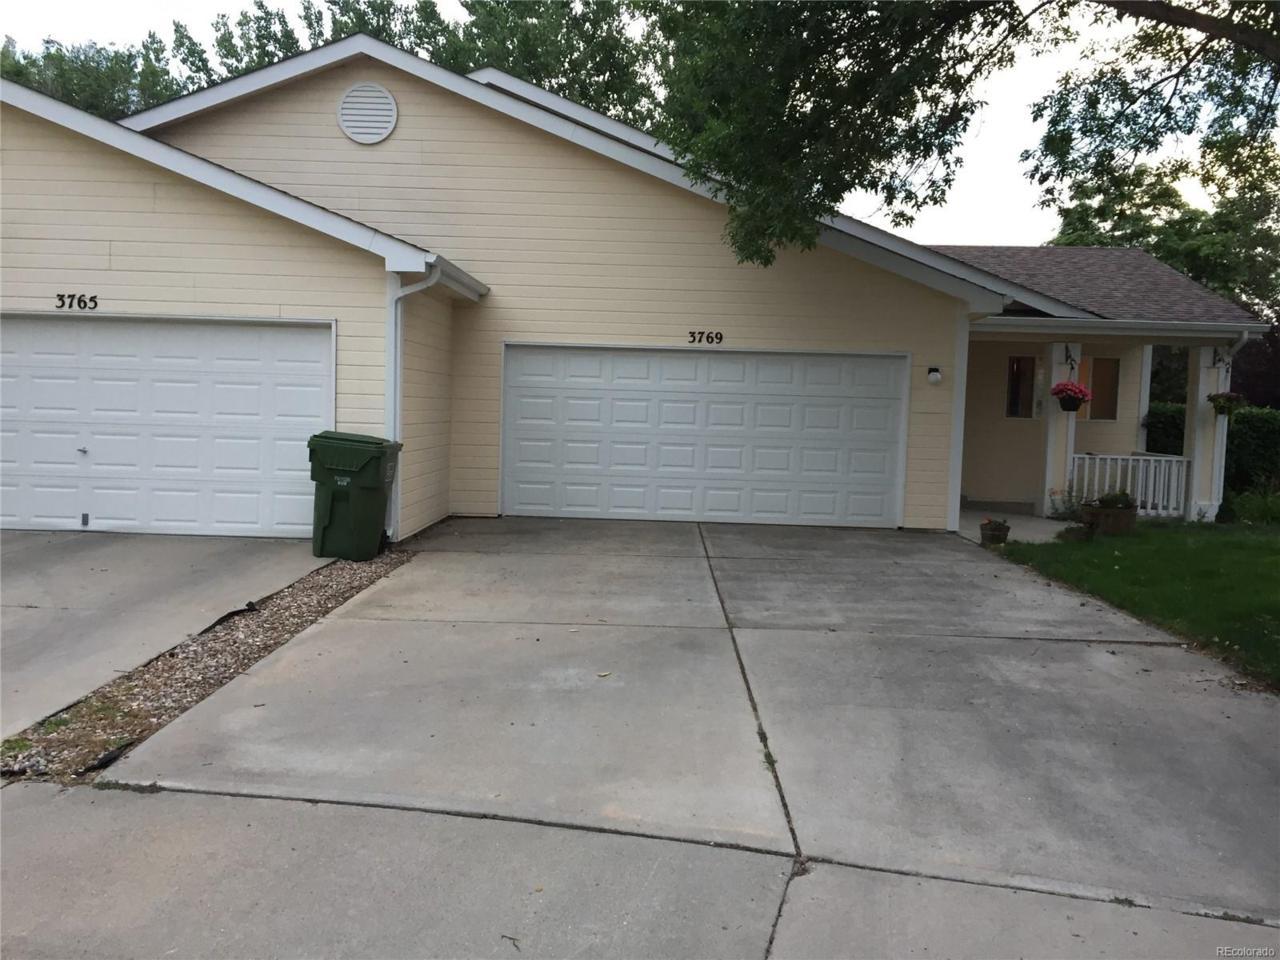 3769 Acacia Court, Loveland, CO 80538 (MLS #3743305) :: 8z Real Estate